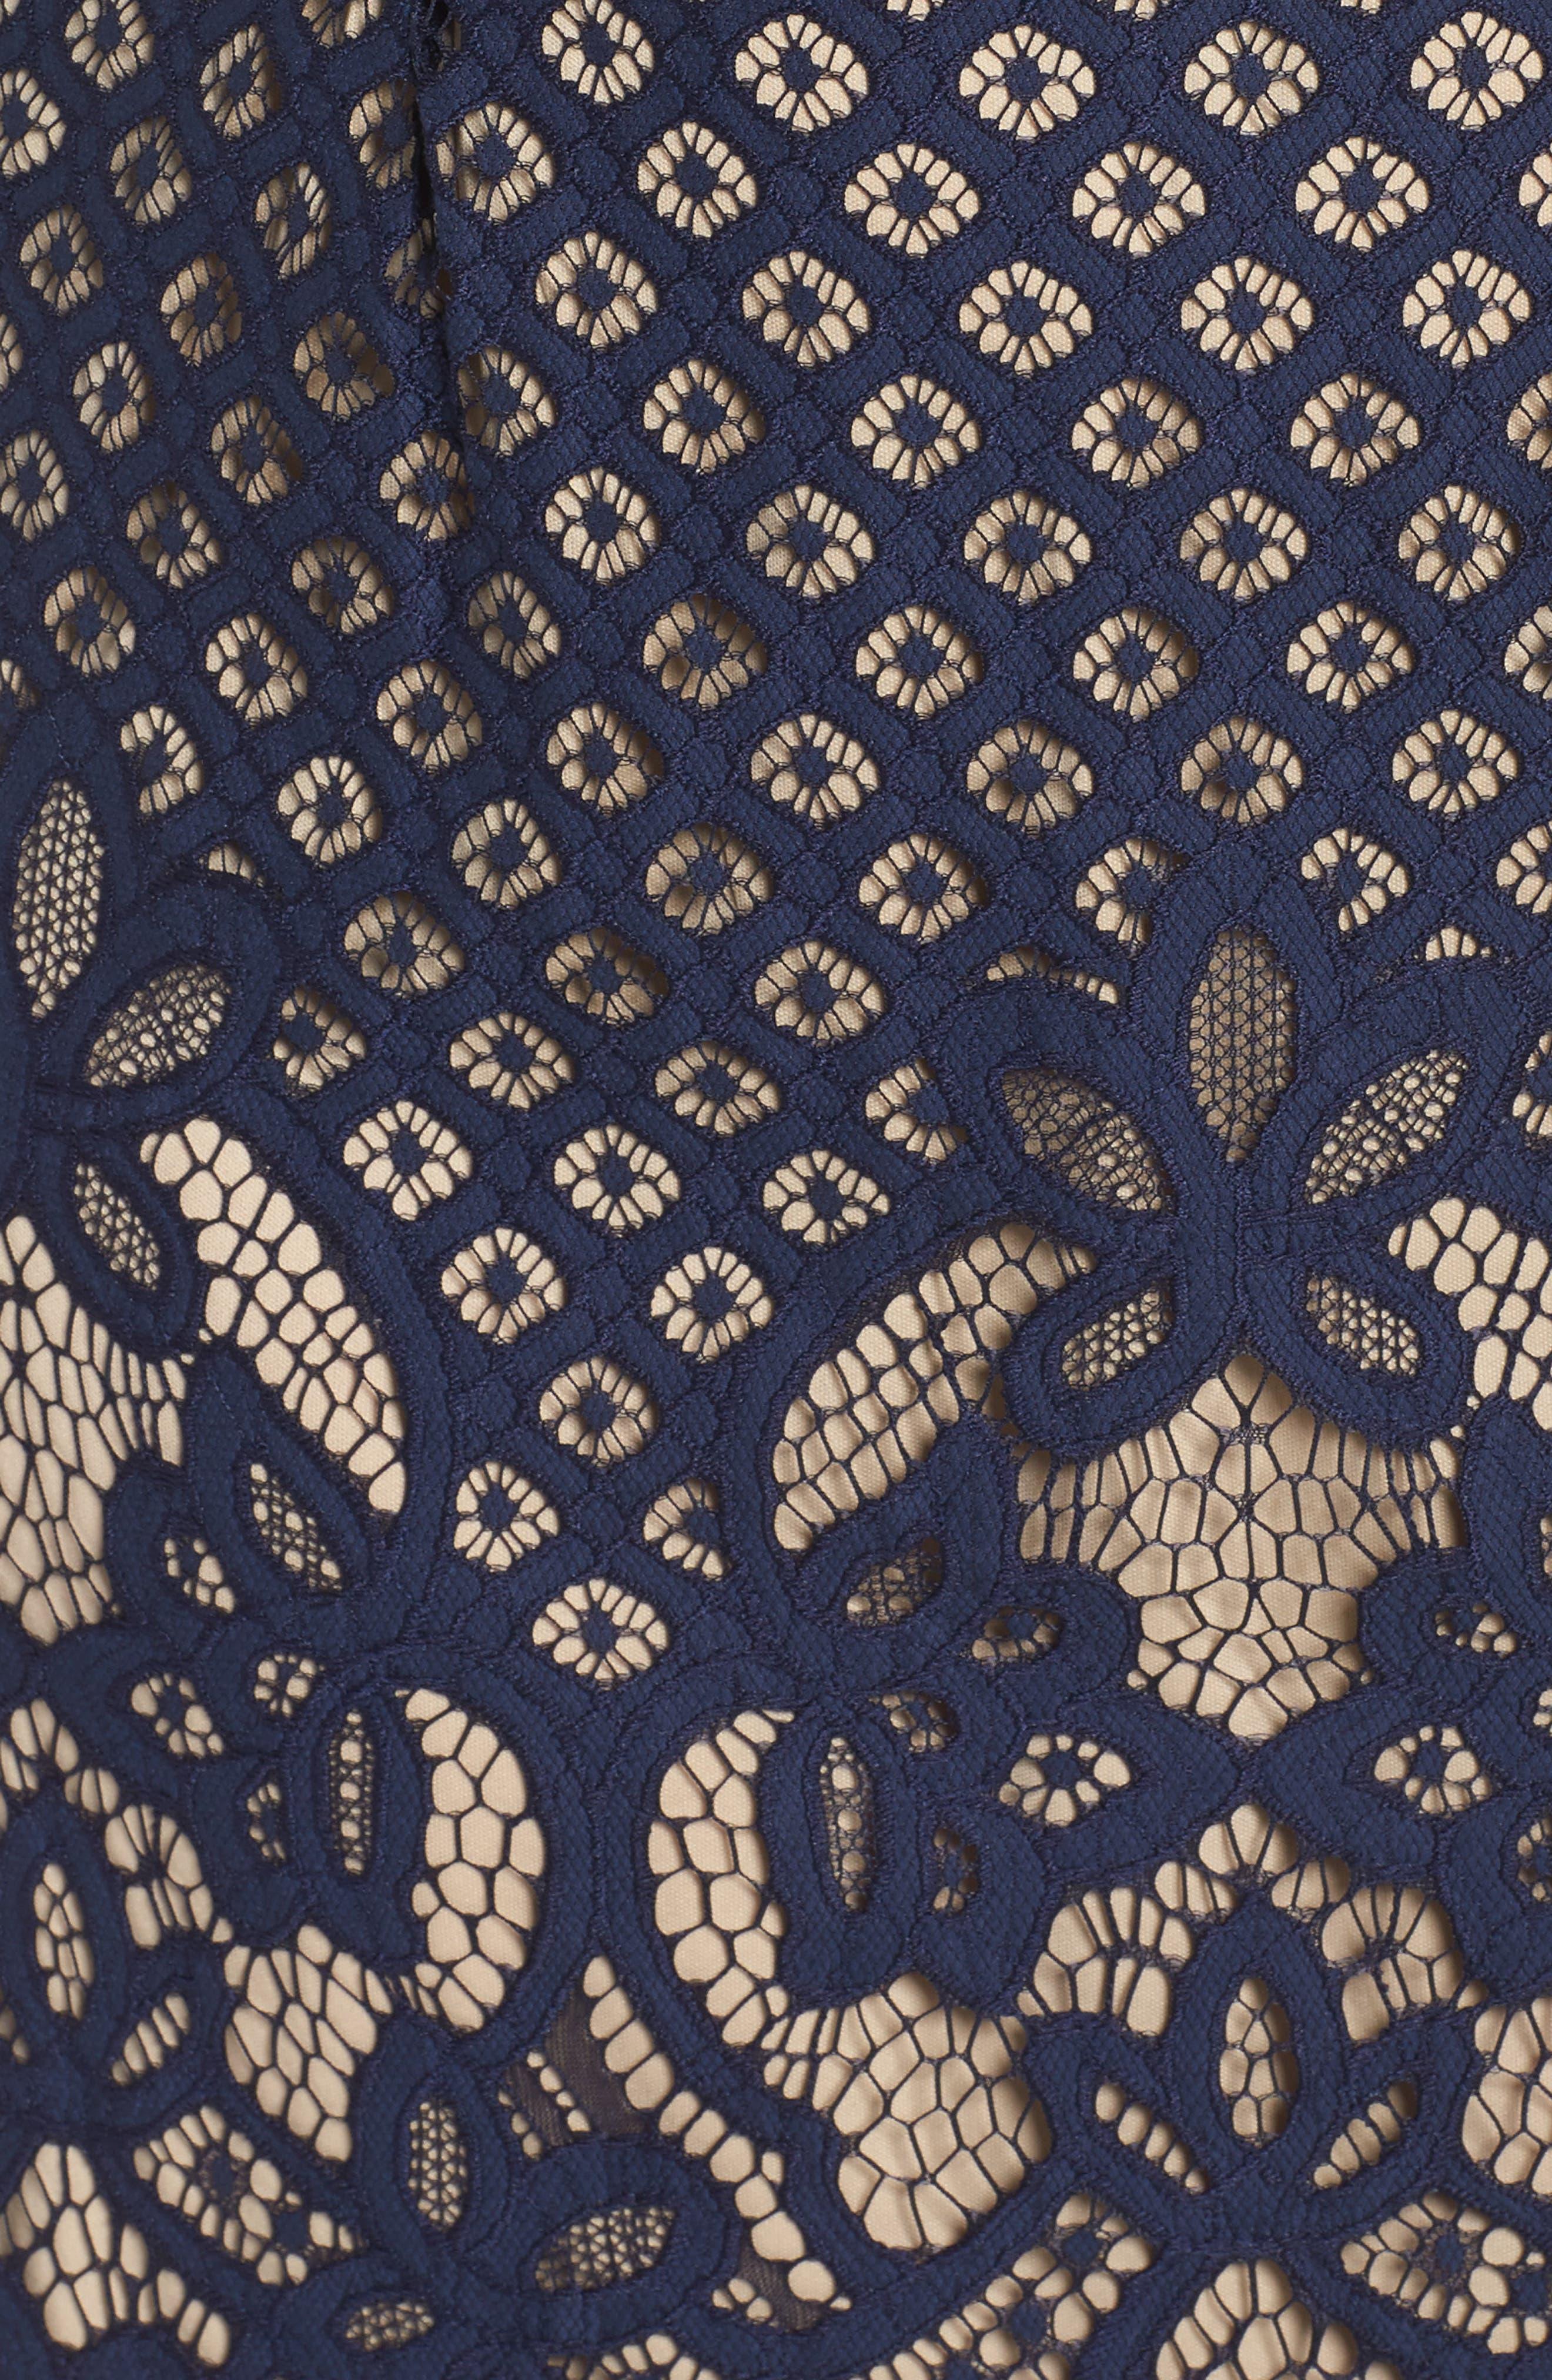 Lace Sheath Dress,                             Alternate thumbnail 5, color,                             410